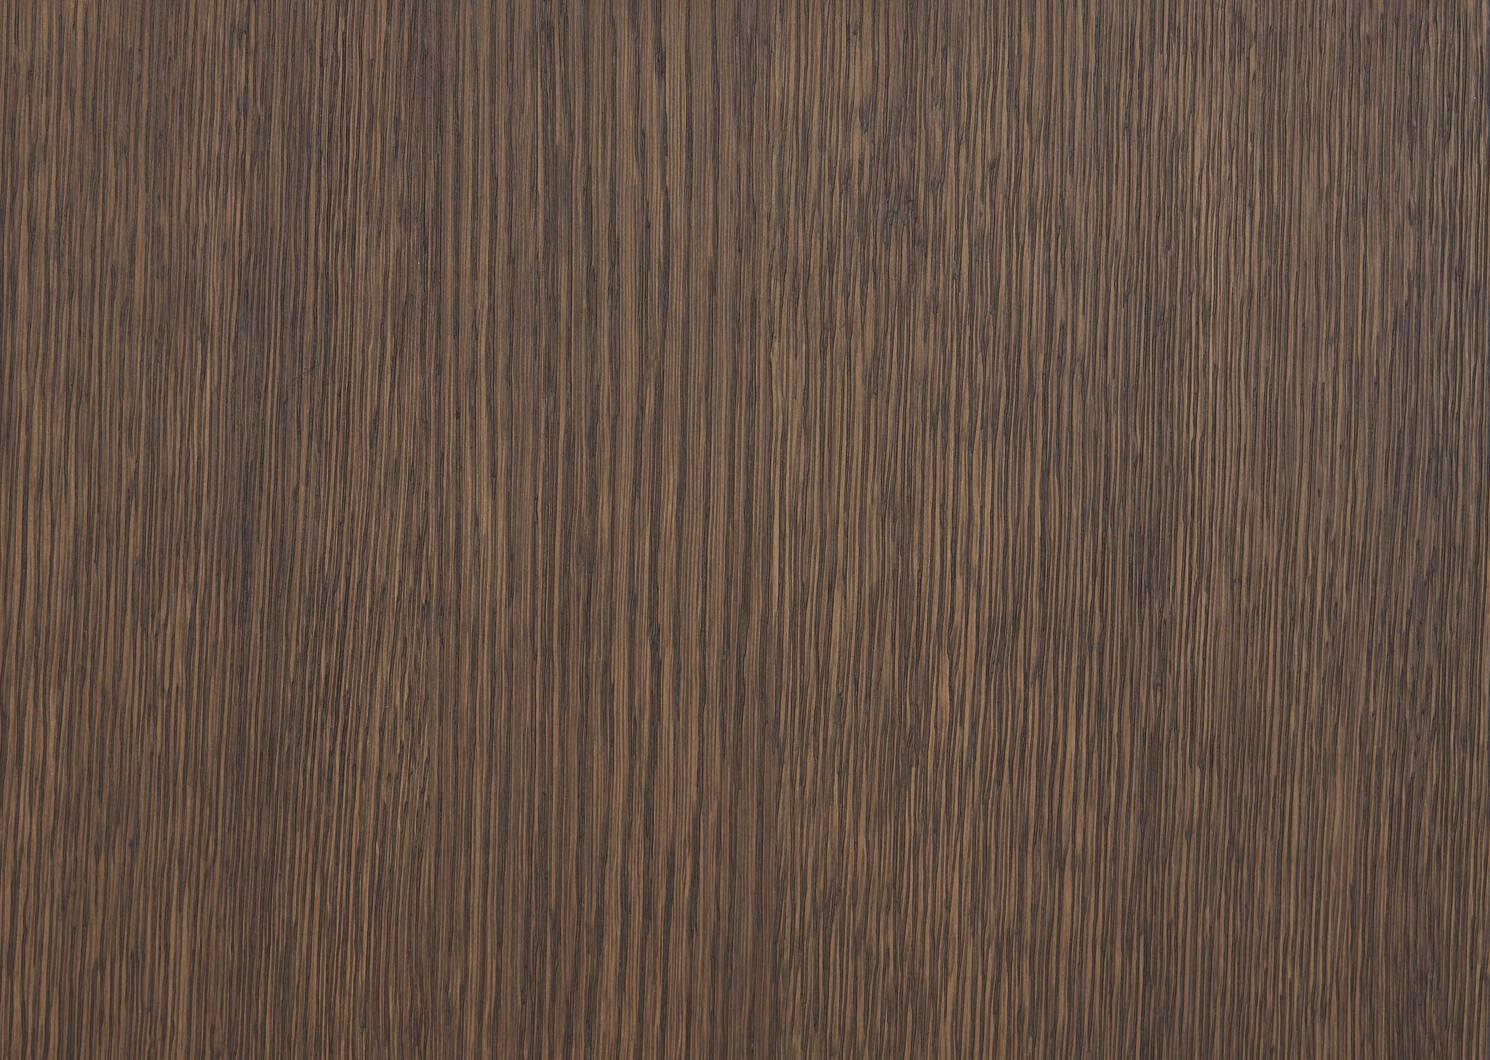 Table de chevet Monteray - Navarro chêne